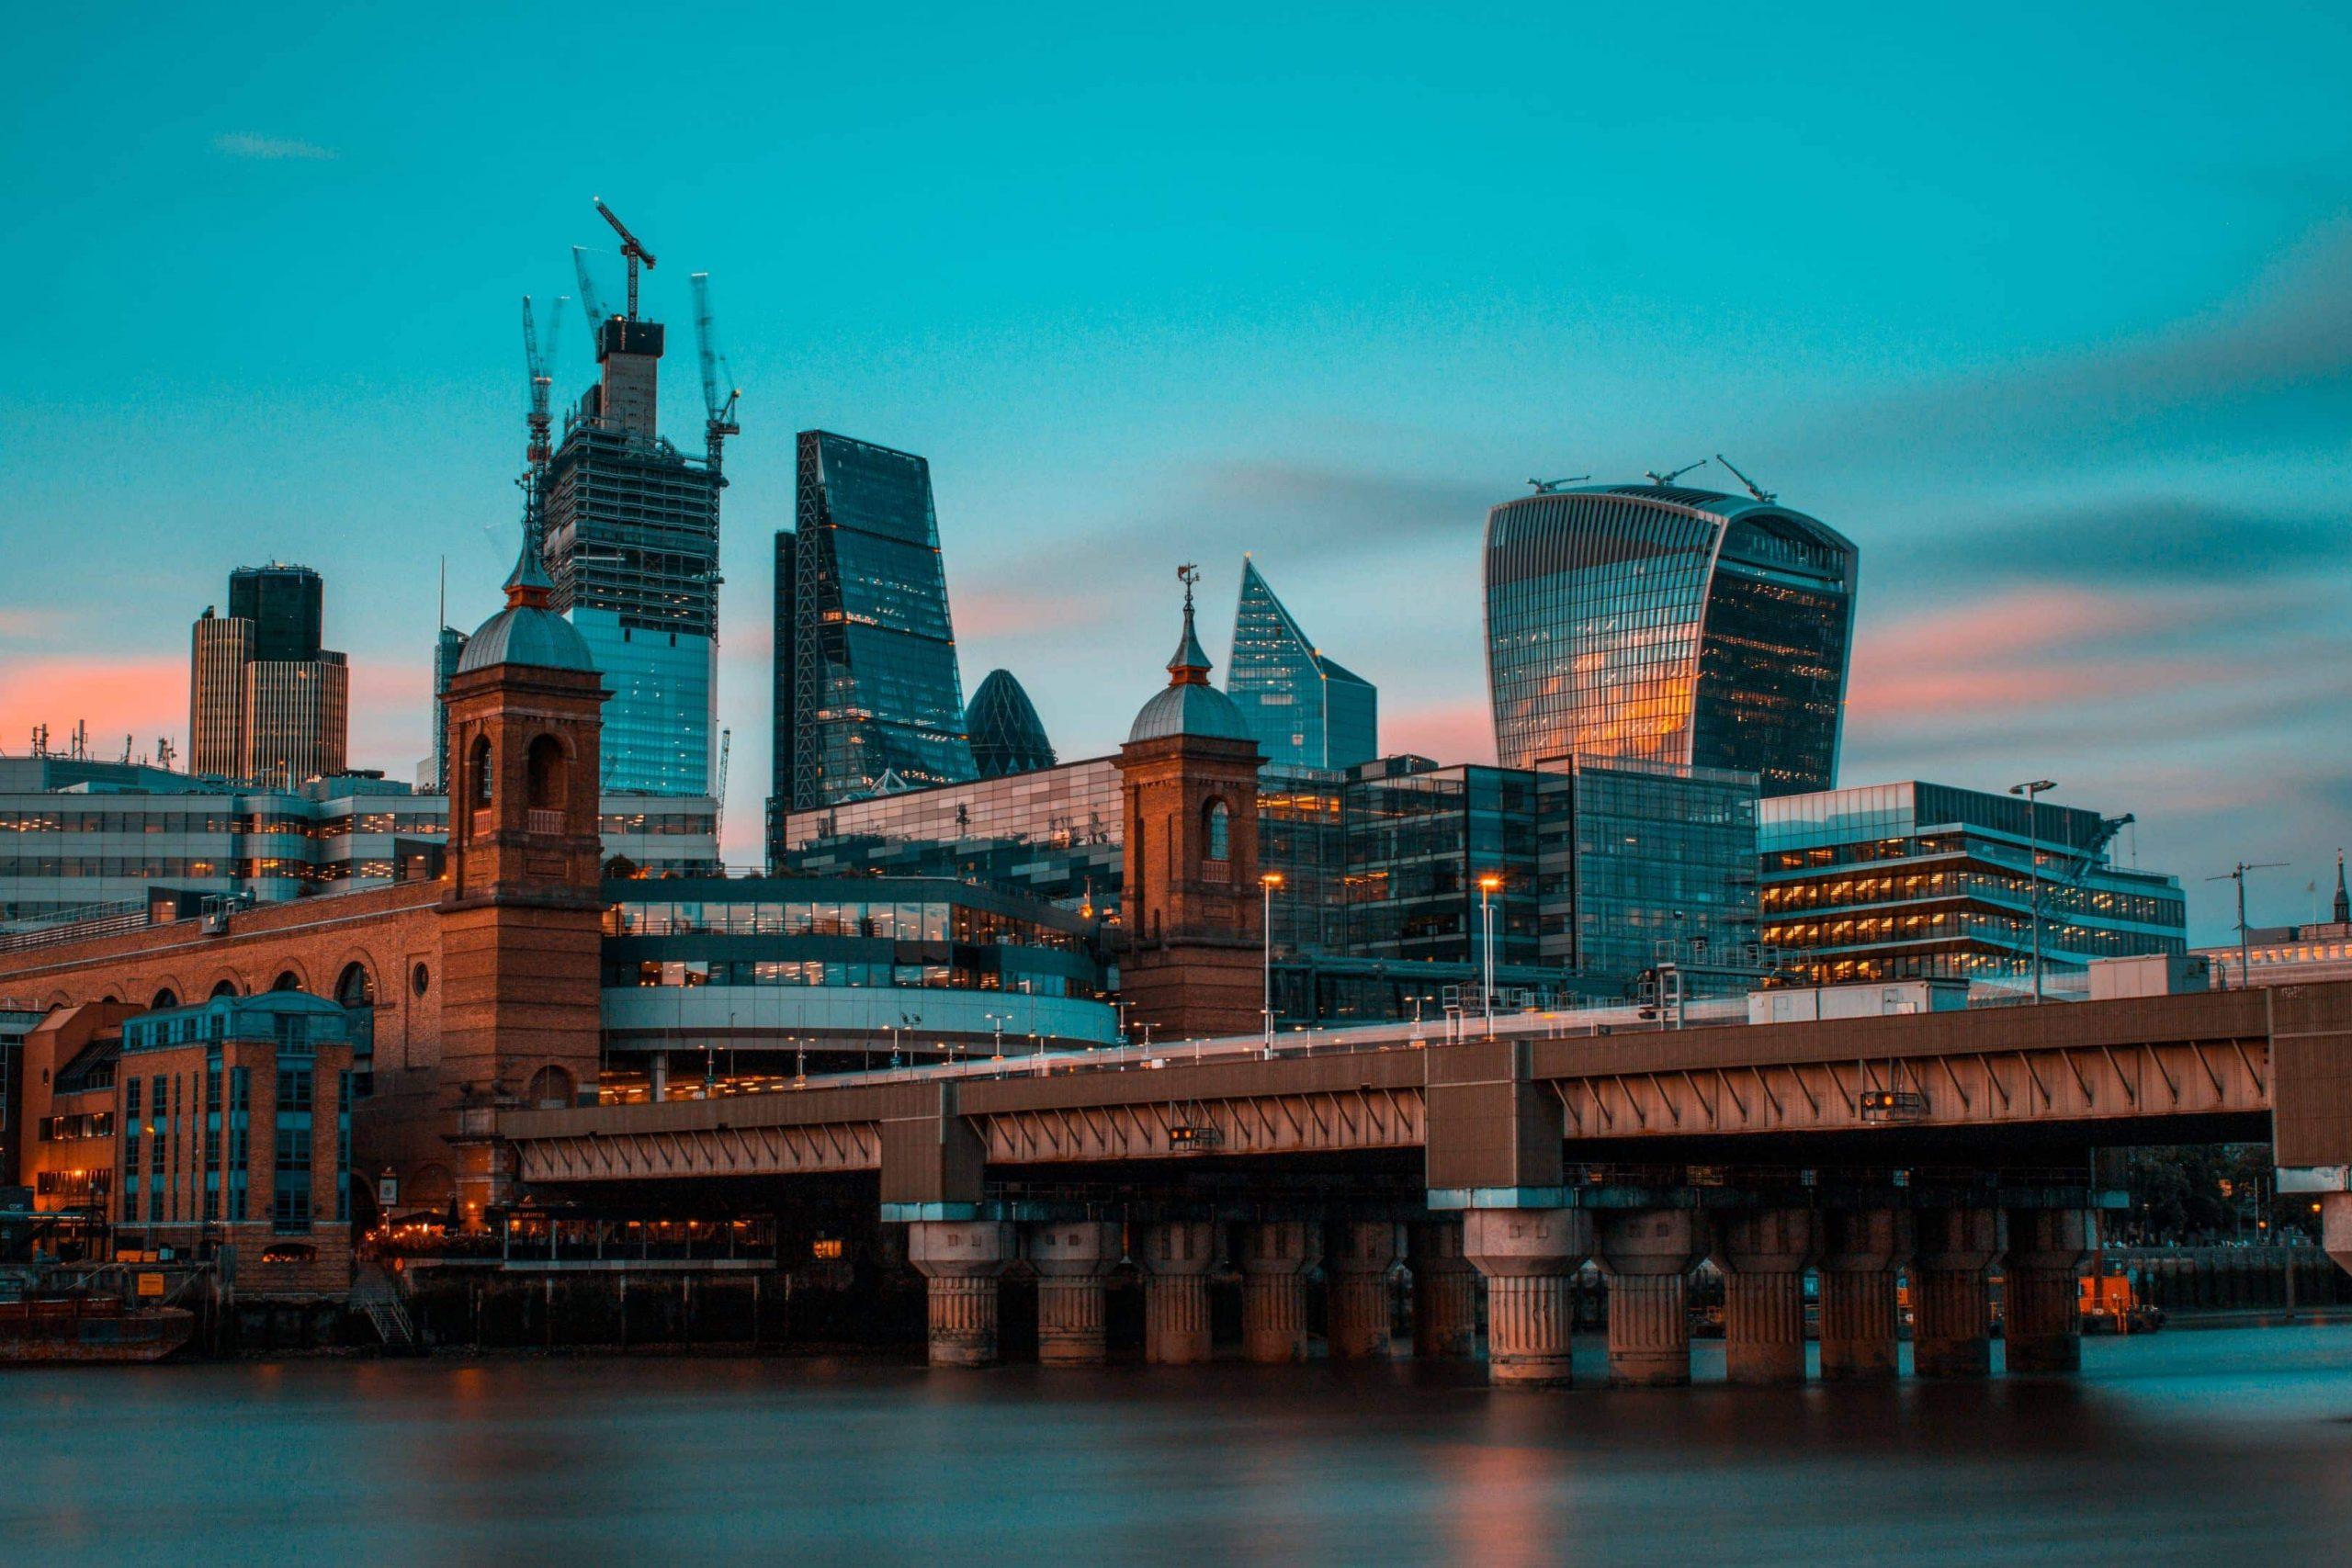 Blackfriars Bridge à Londres